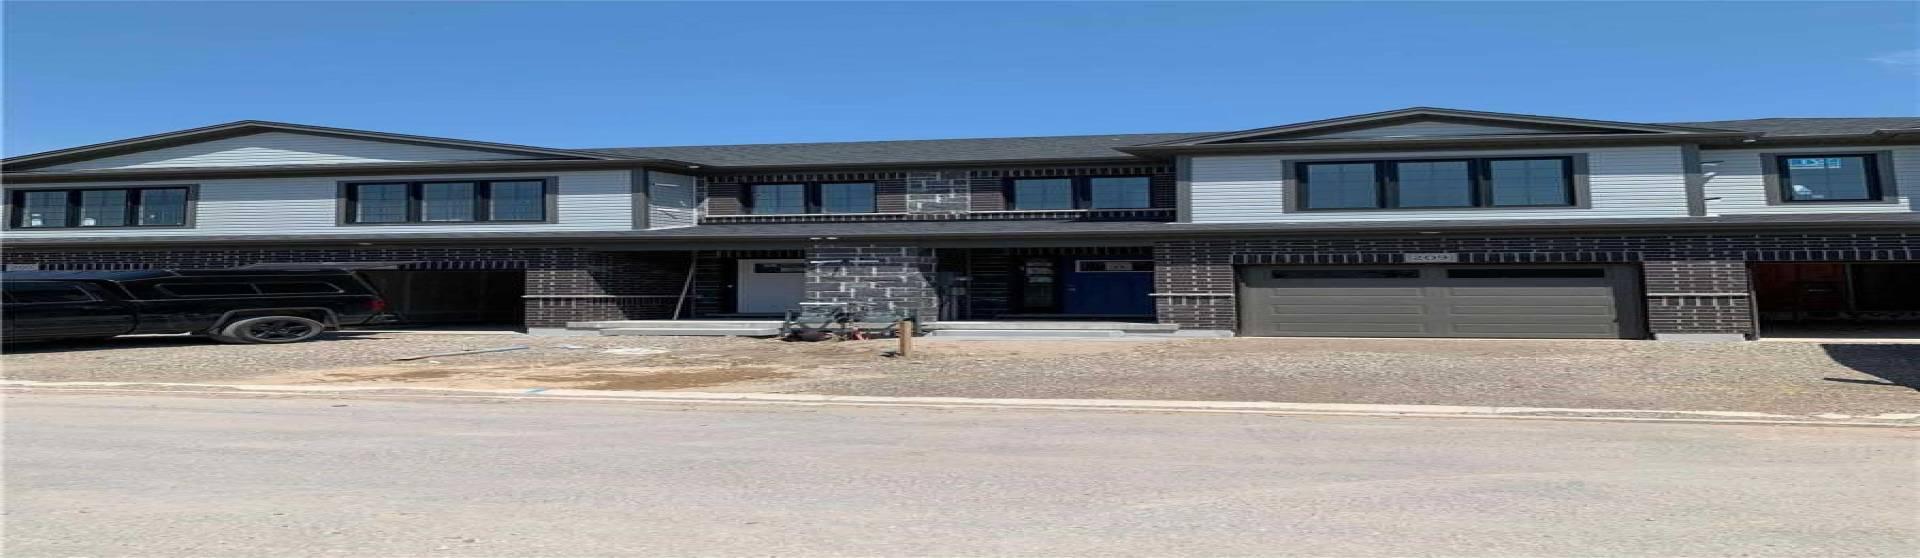 209 Woodmeadow Crt, Kitchener, Ontario N2R0P8, 3 Bedrooms Bedrooms, 6 Rooms Rooms,2 BathroomsBathrooms,Att/row/twnhouse,Lease,Woodmeadow,X4779422